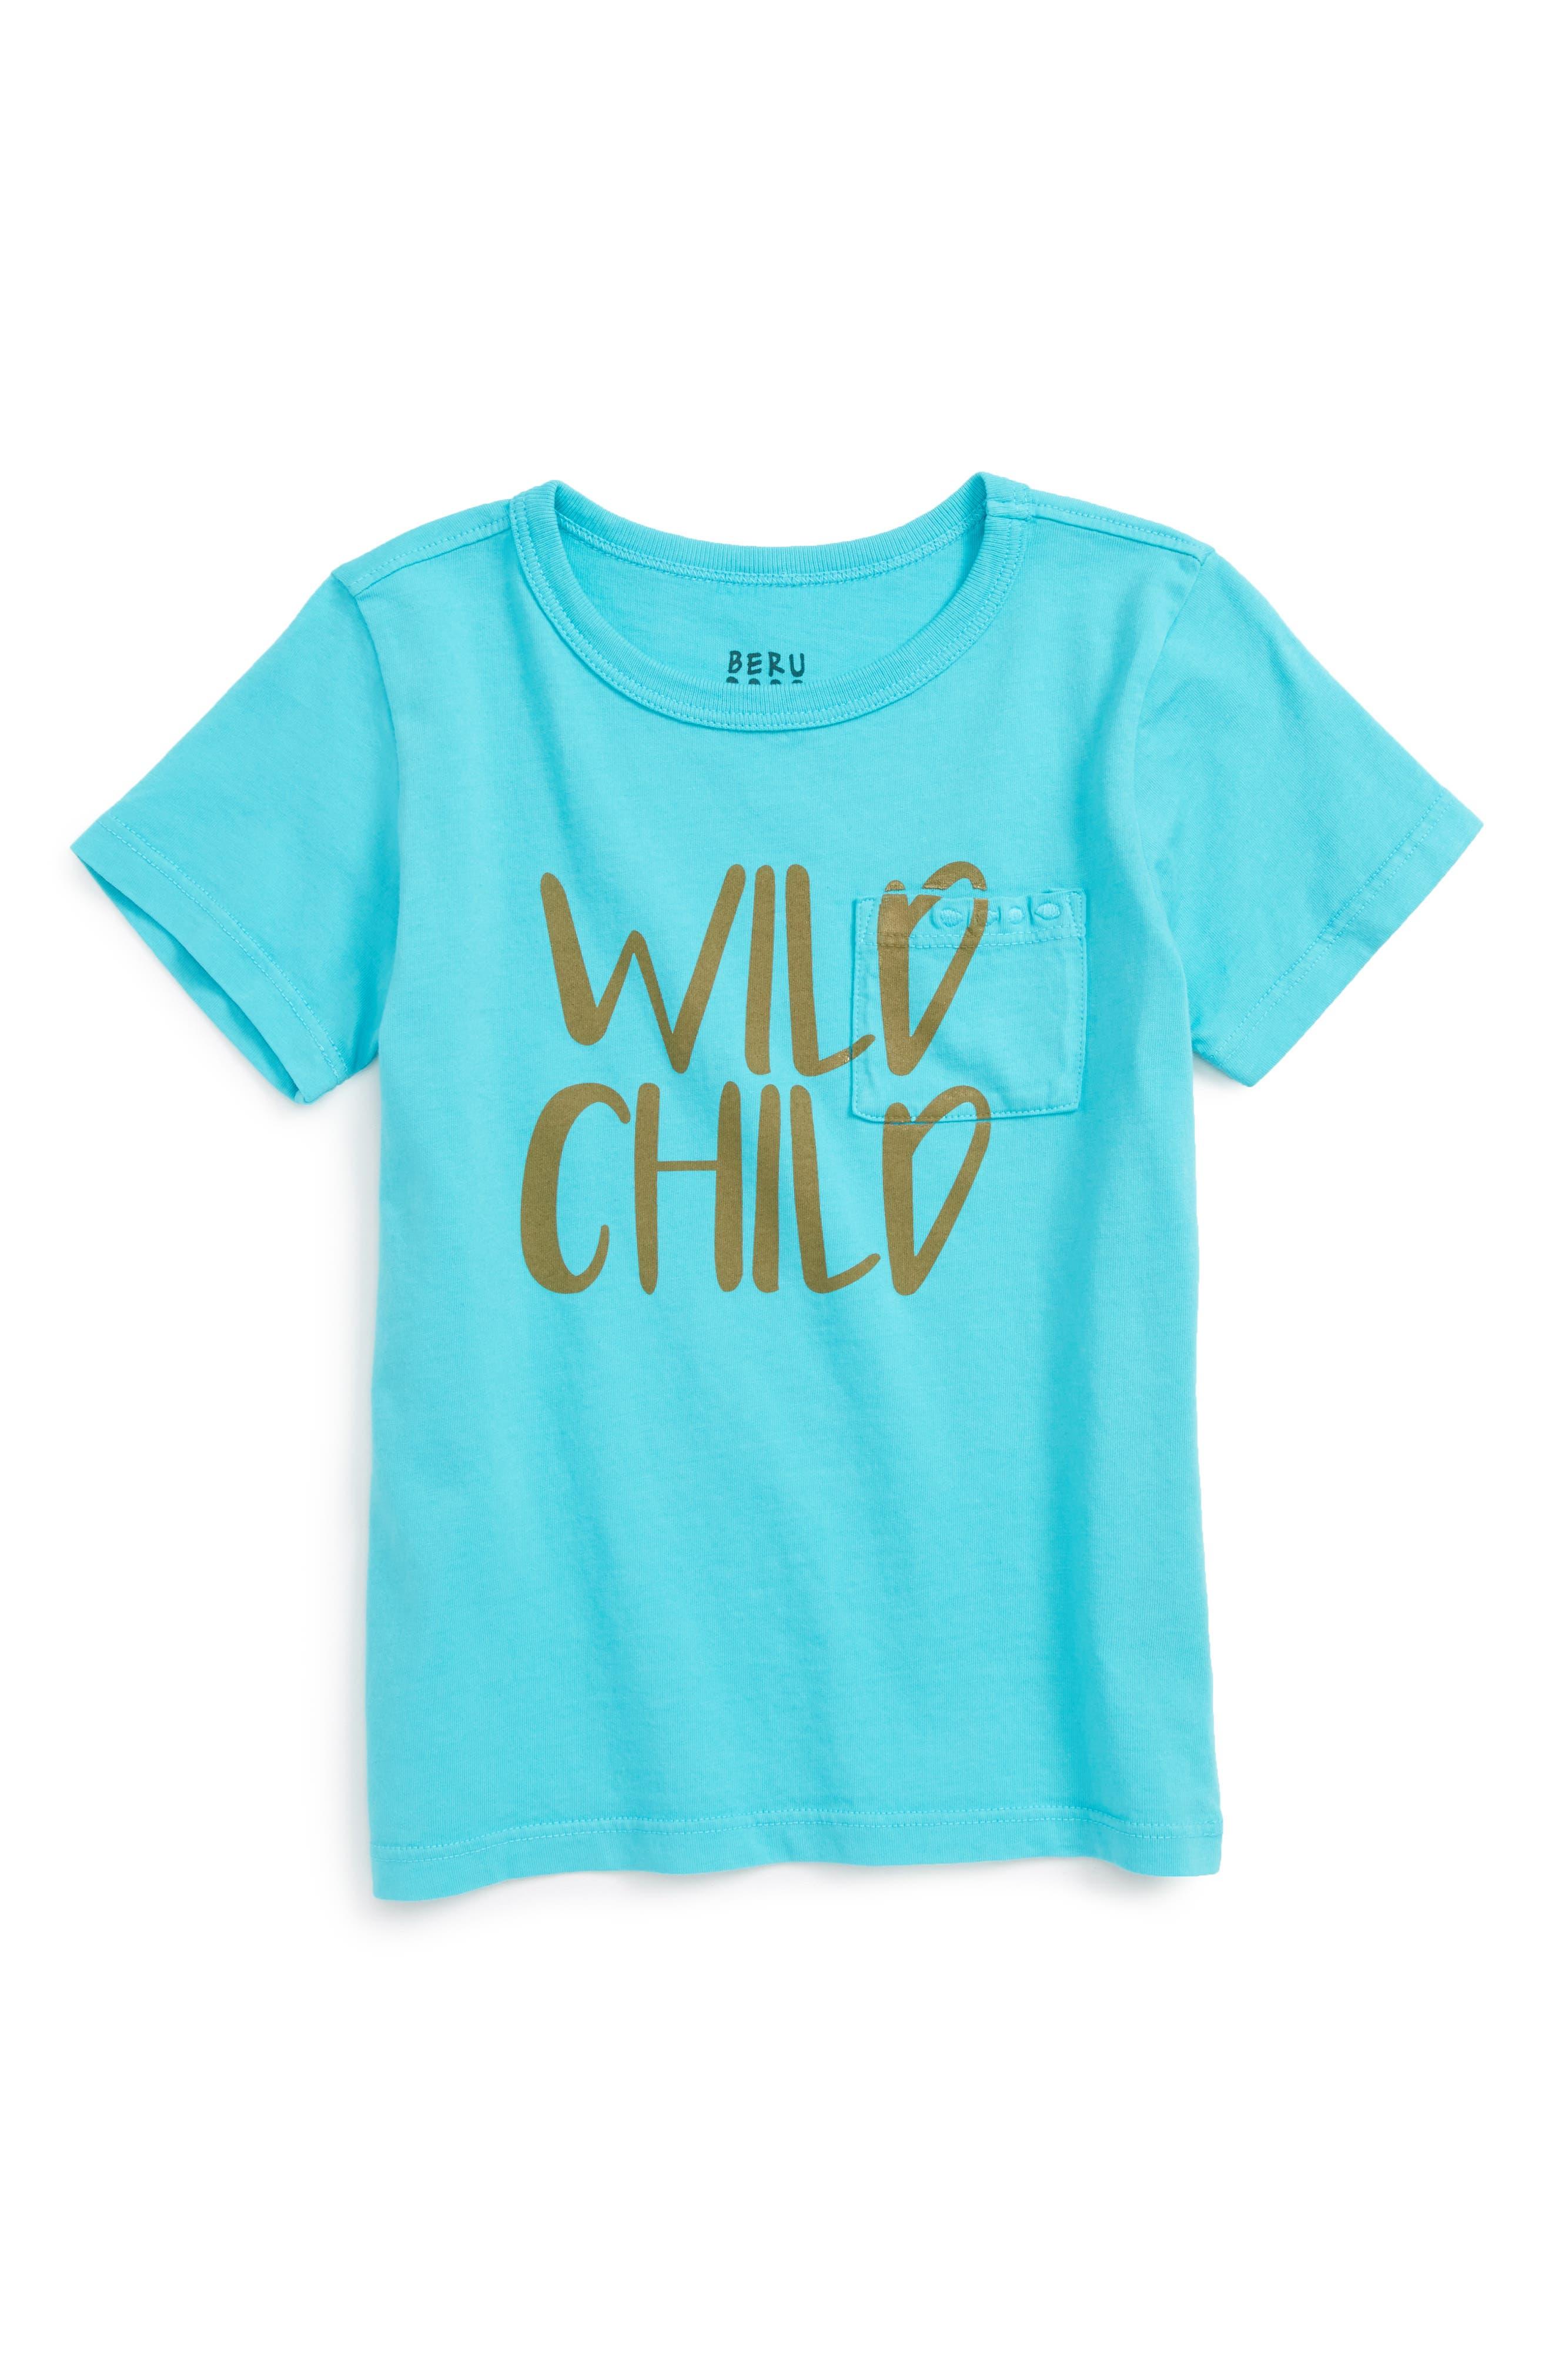 Alternate Image 1 Selected - BERU Wild Child Organic Cotton Tee (Toddler Boys & Little Boys)